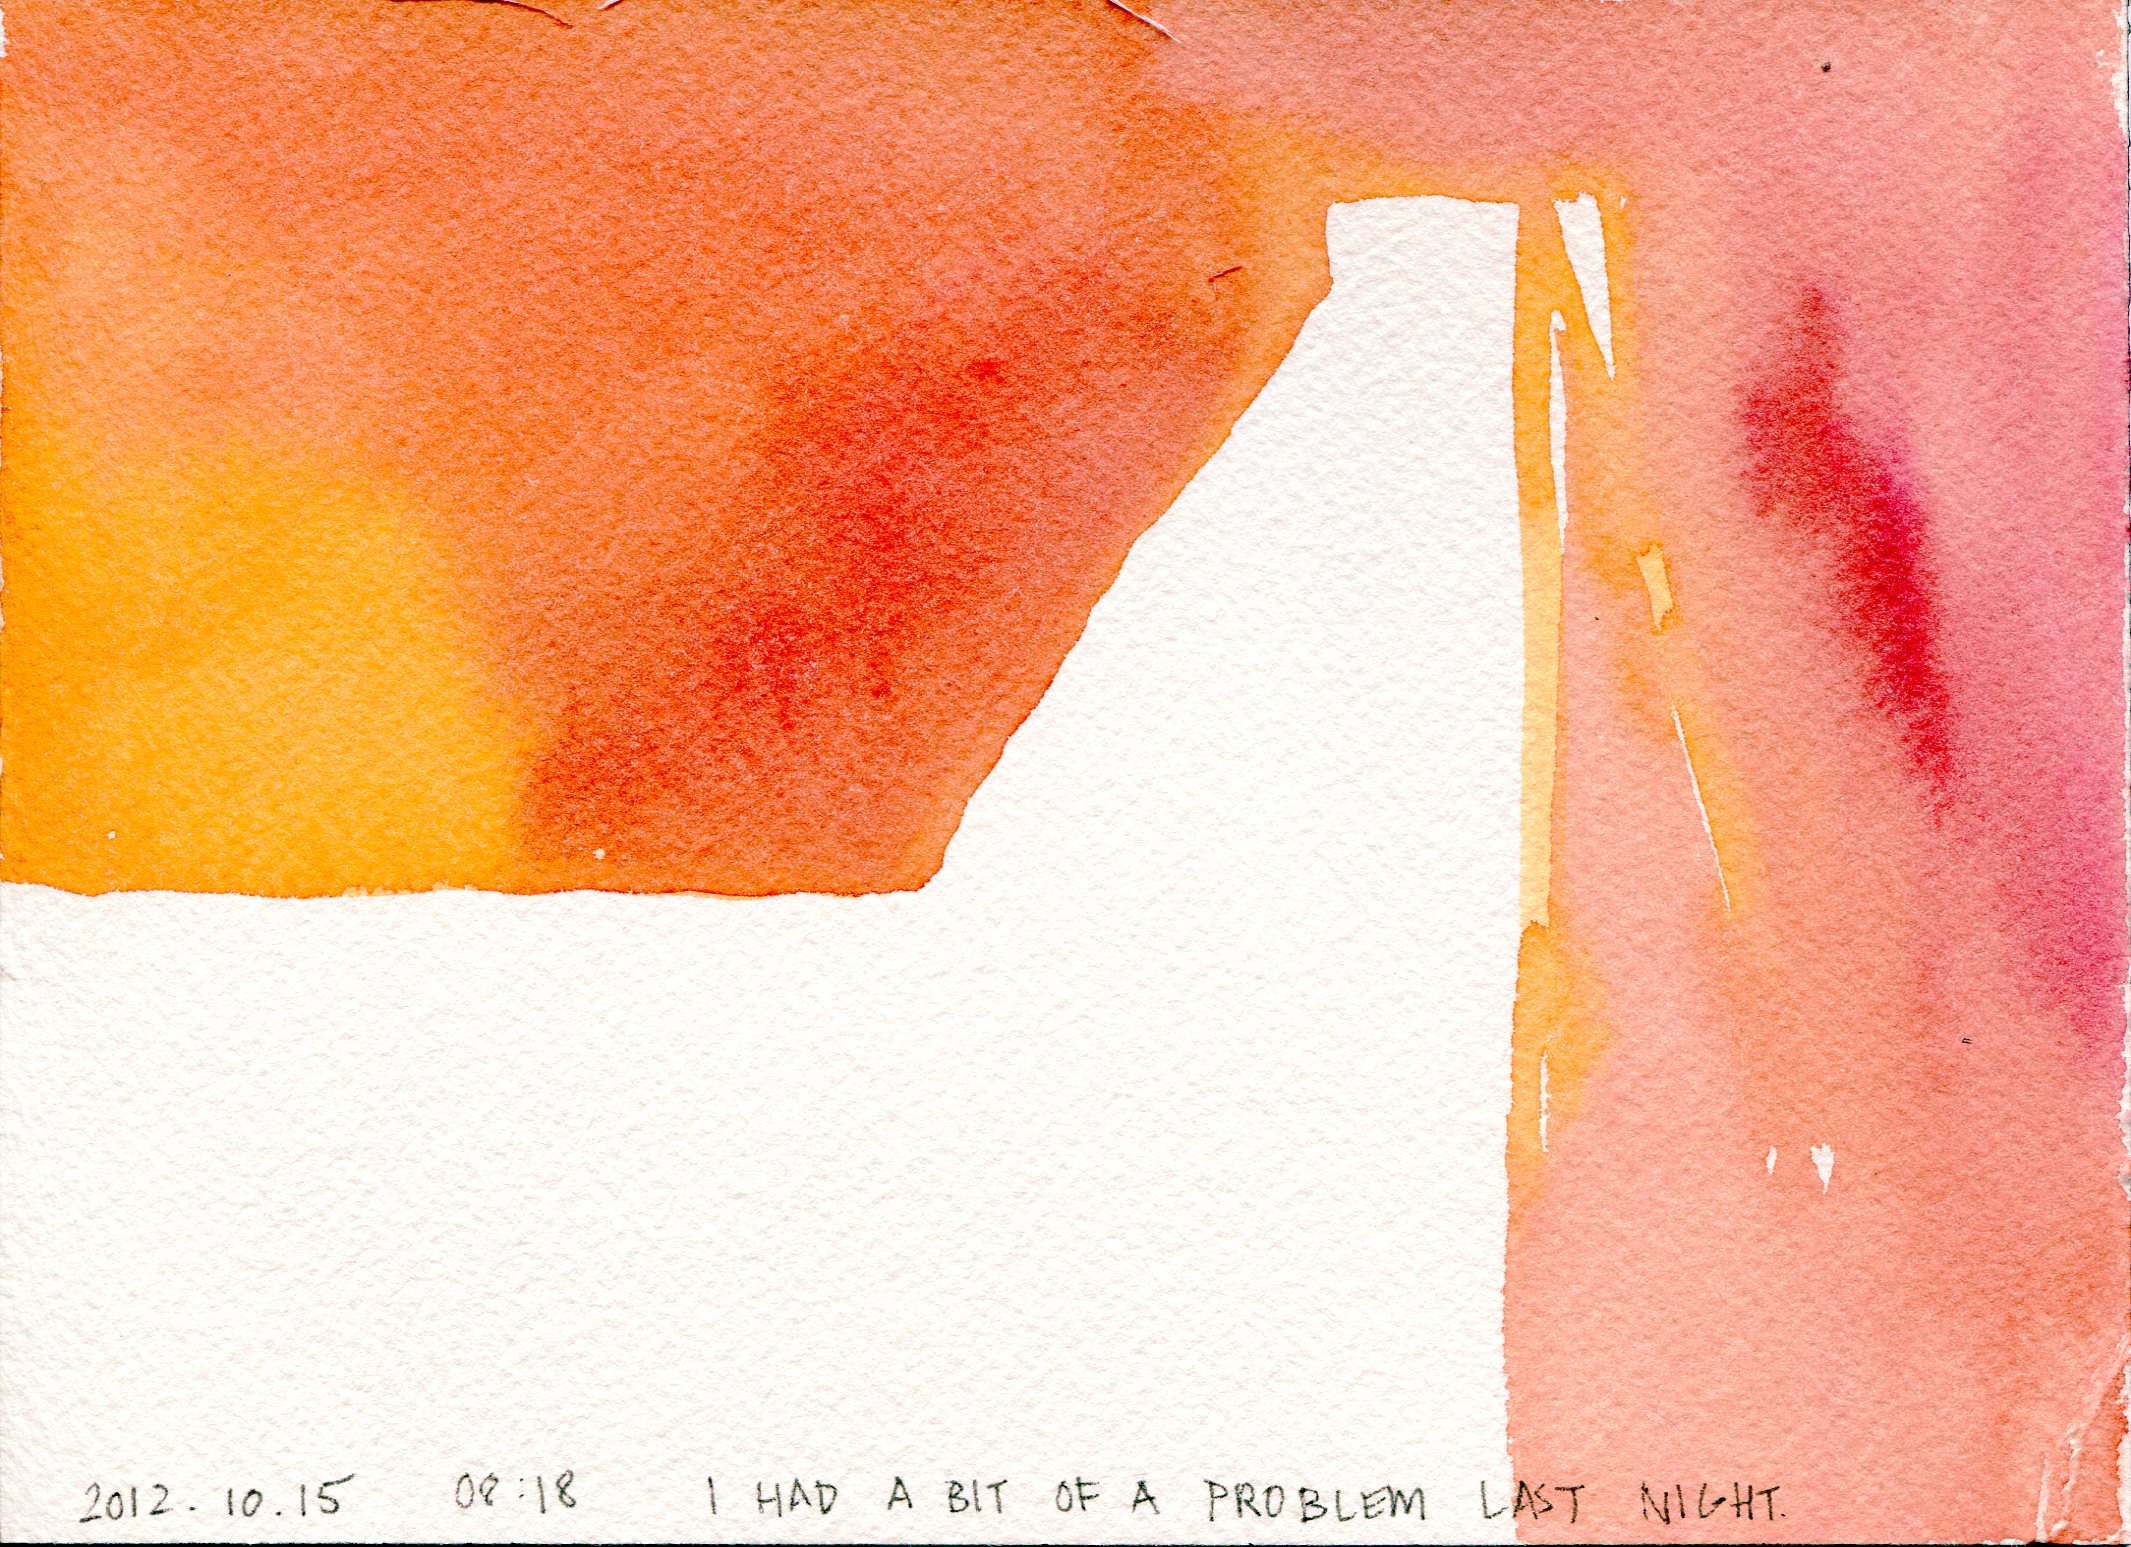 2012-10-20 drawing001.jpg